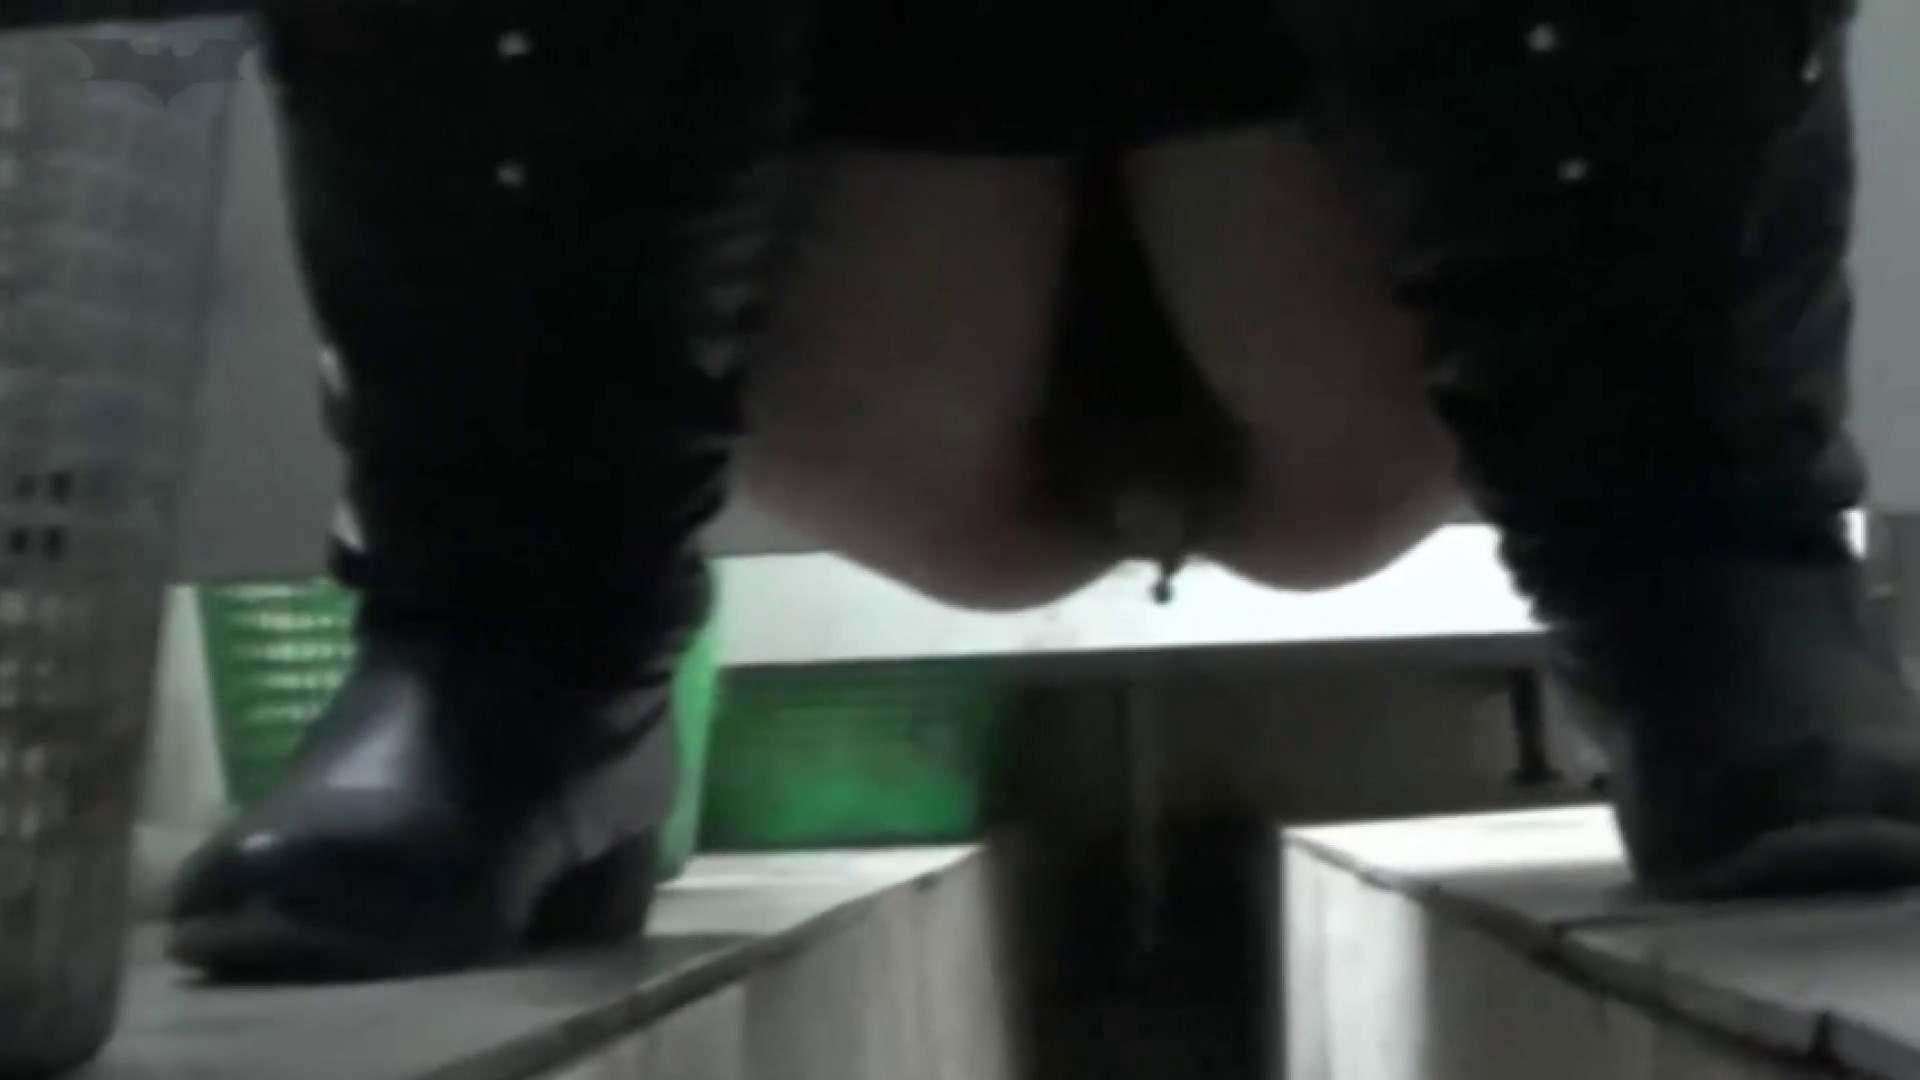 JD盗撮 美女の洗面所の秘密 Vol.29 美女 オマンコ無修正動画無料 87画像 82